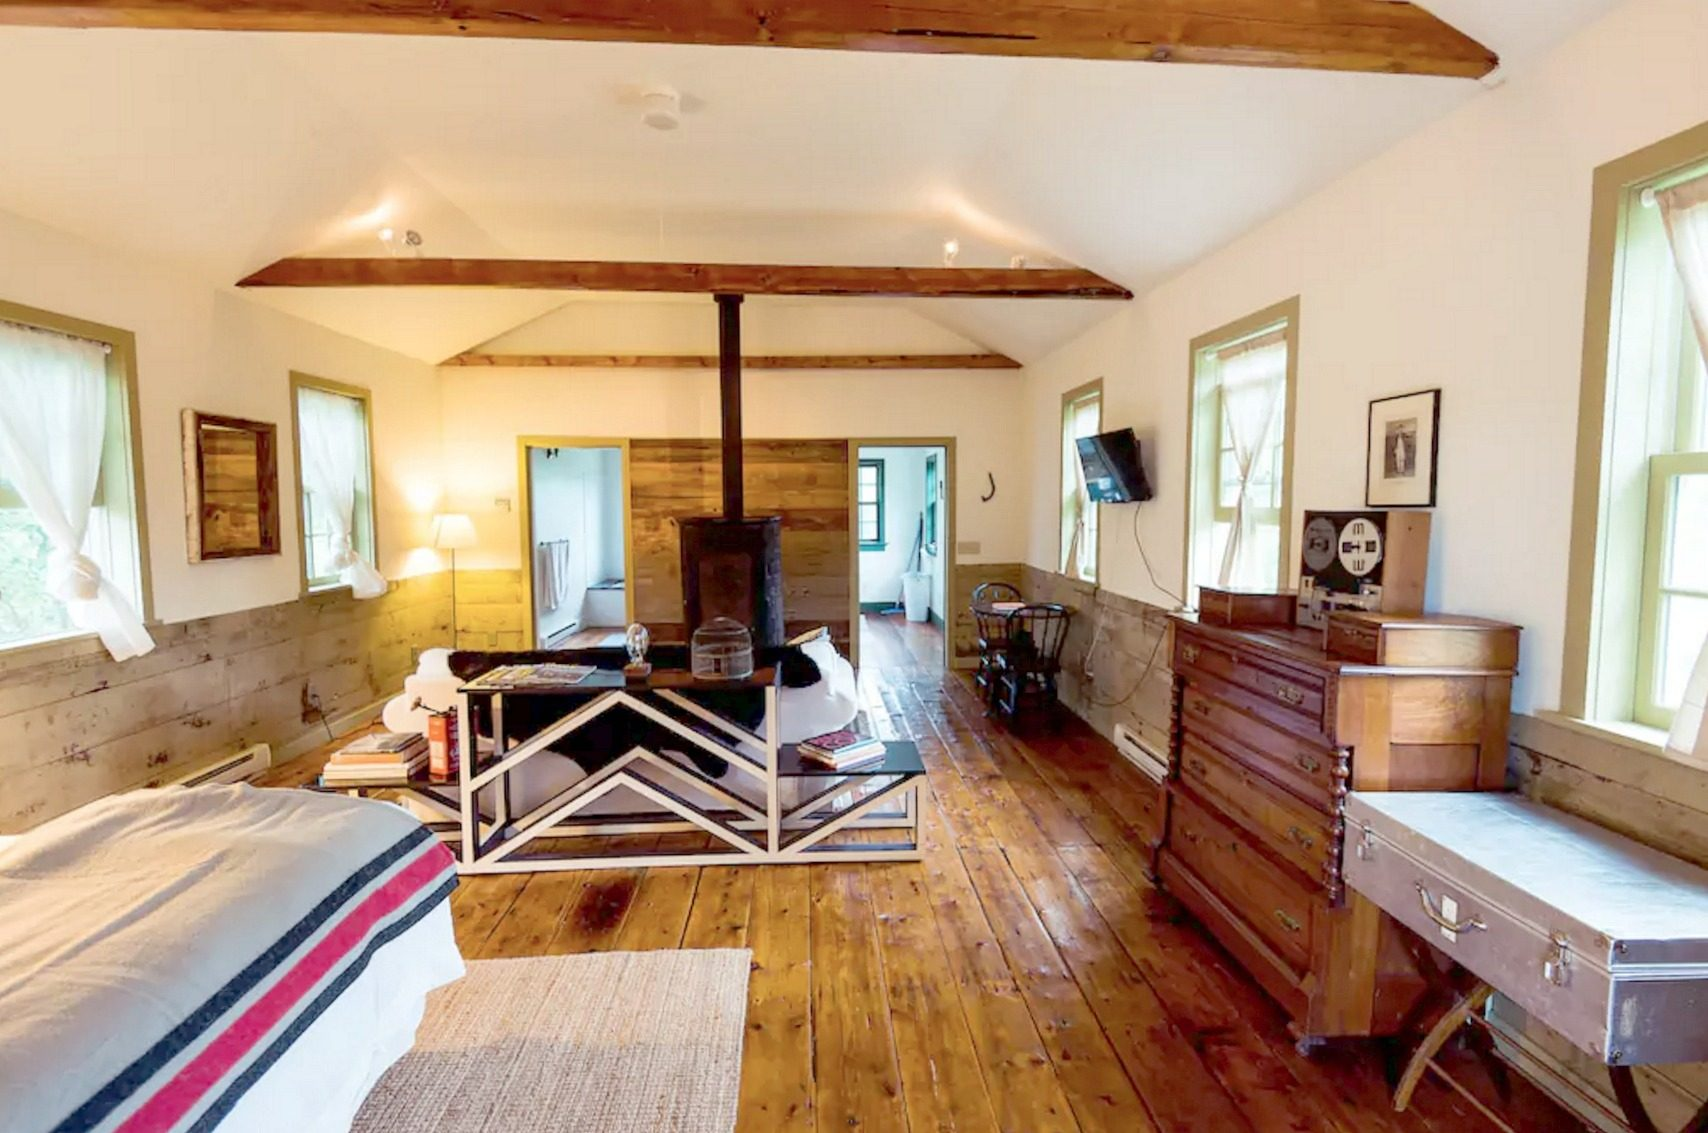 catskills-schoolhouse-airbnb-6